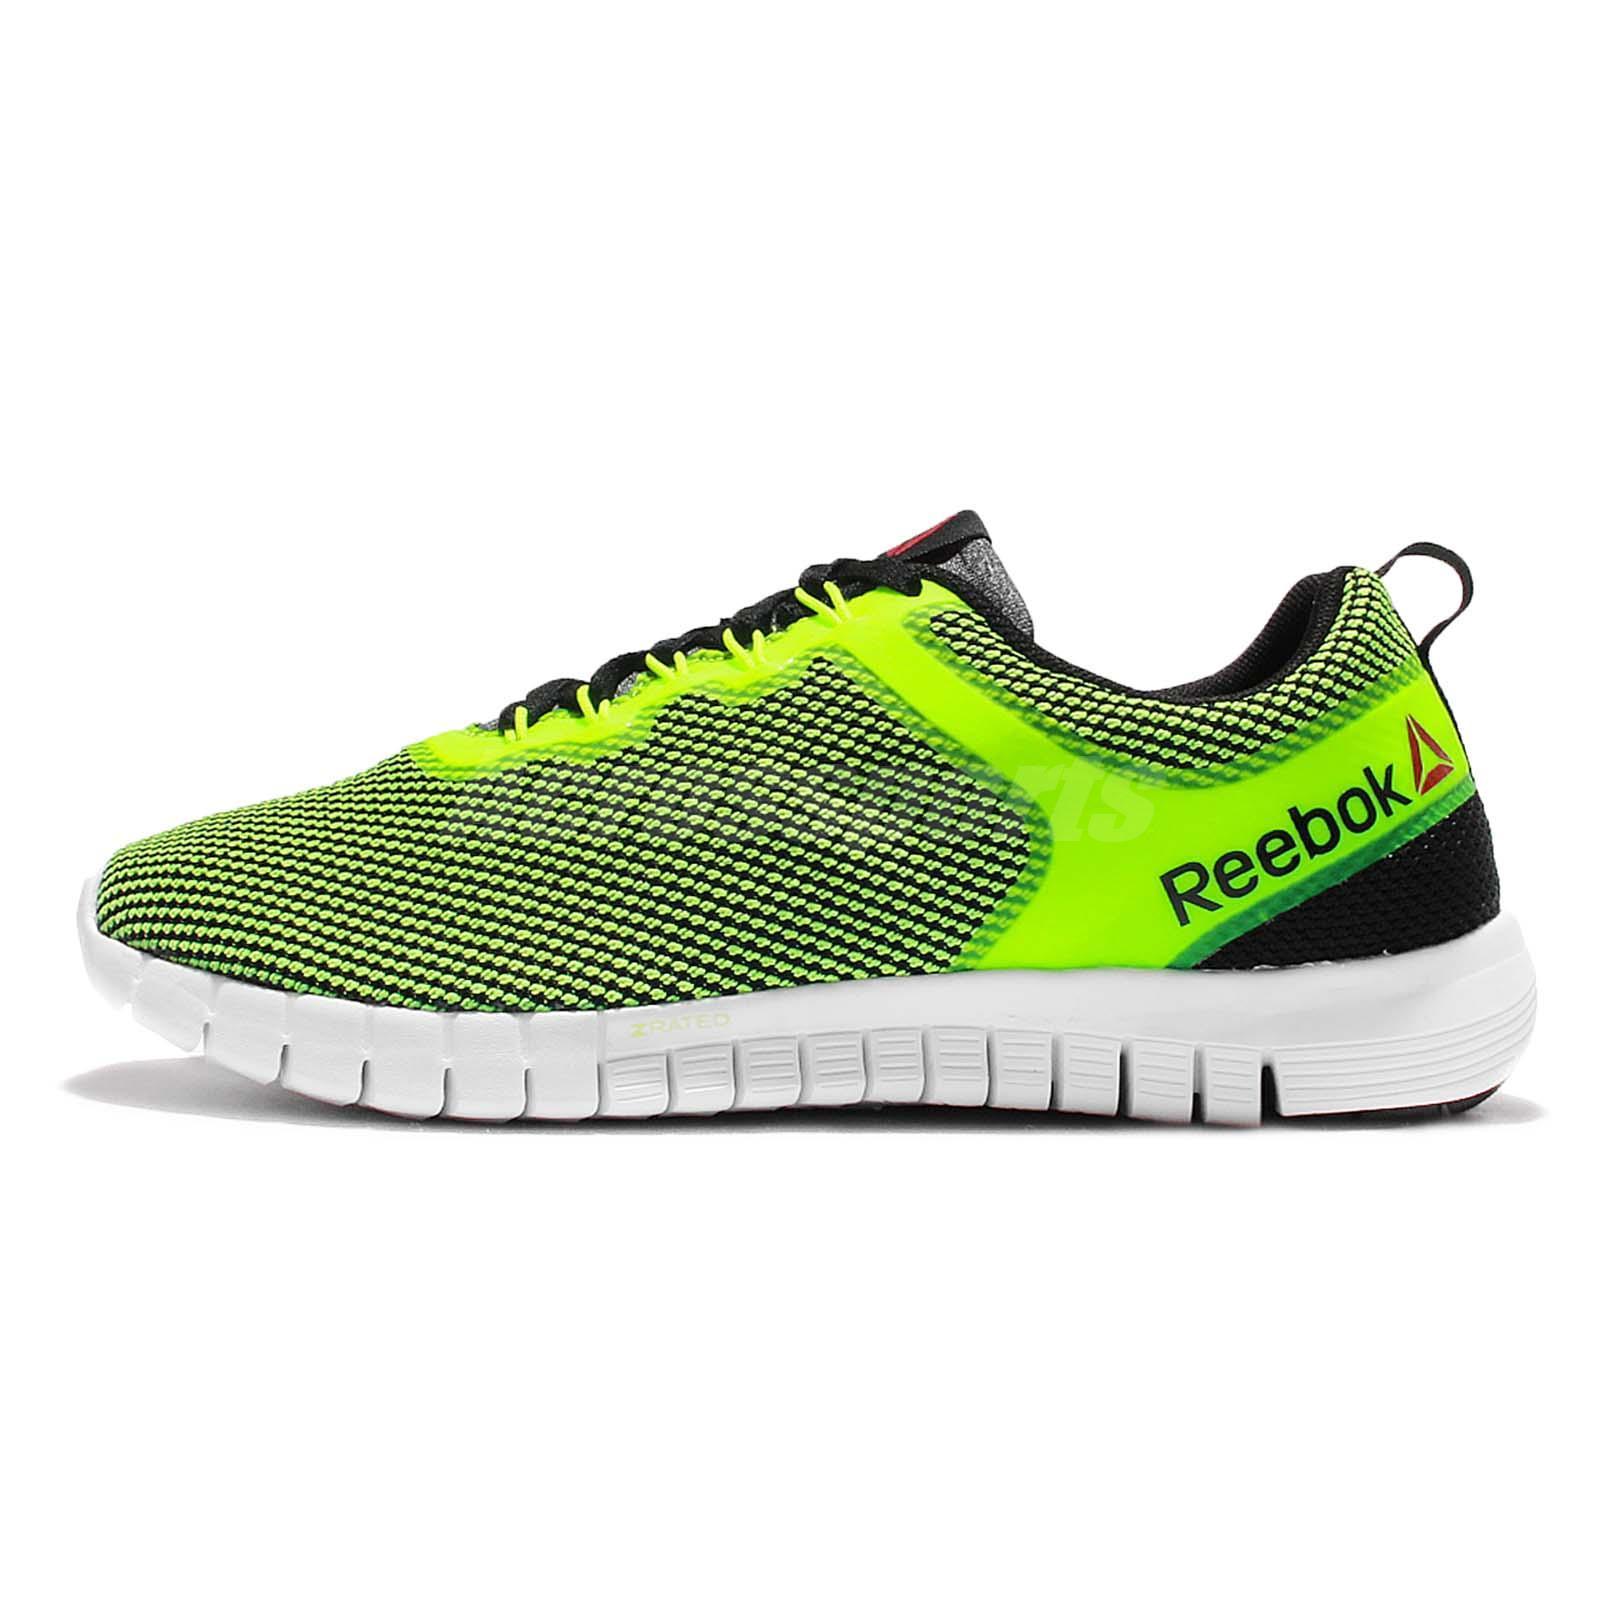 Reebok ZQuick Lite Yellow Green White Mens Running Shoes Sneakers V71829